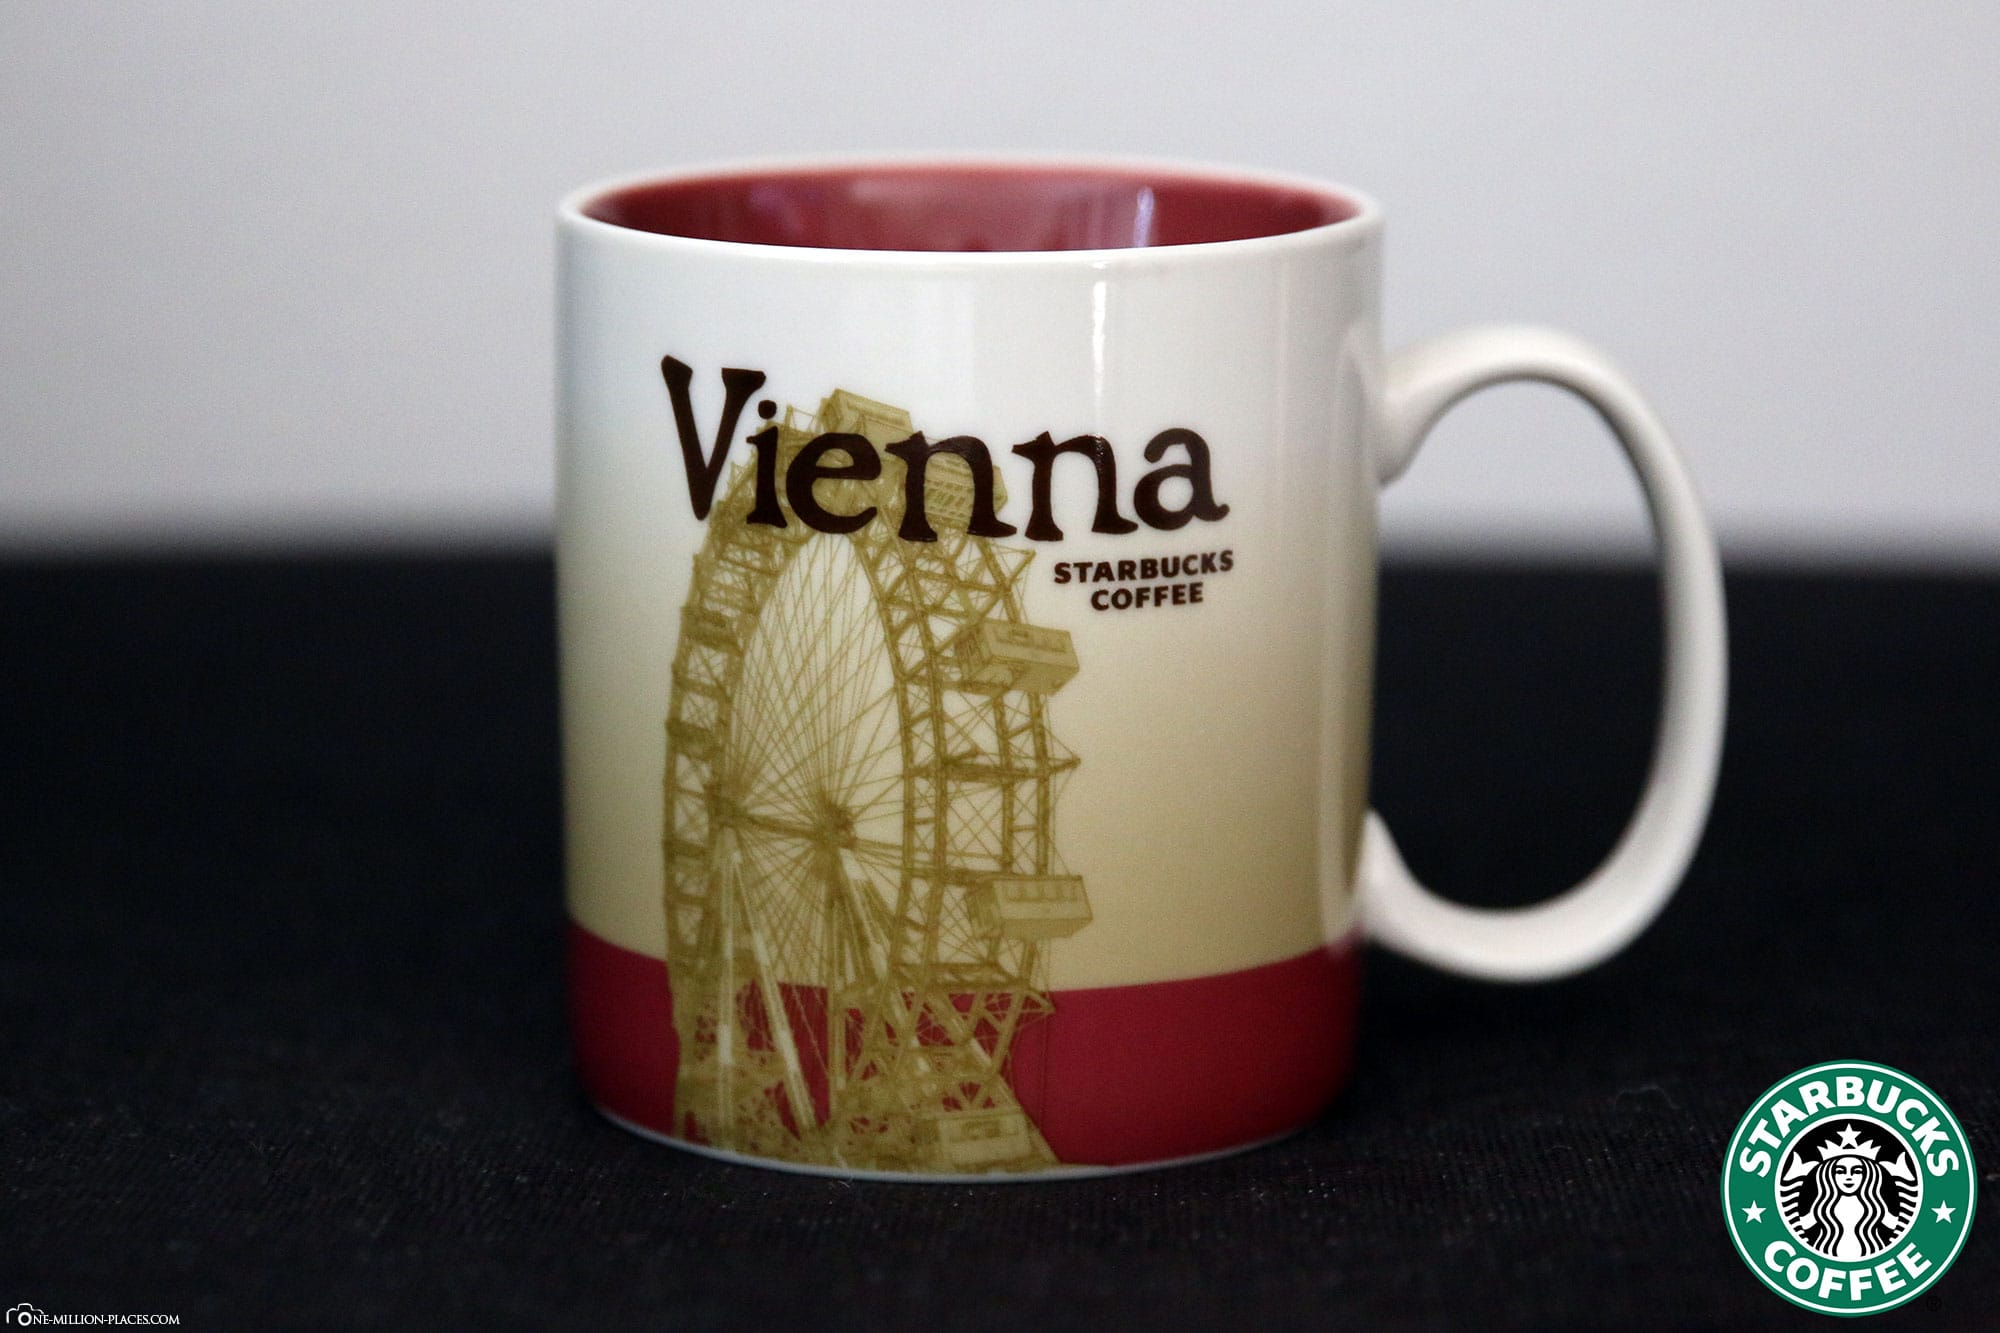 Vienna, Starbucks Cup, Global Icon Series, City Mugs, Collection, Austria, Travelreport